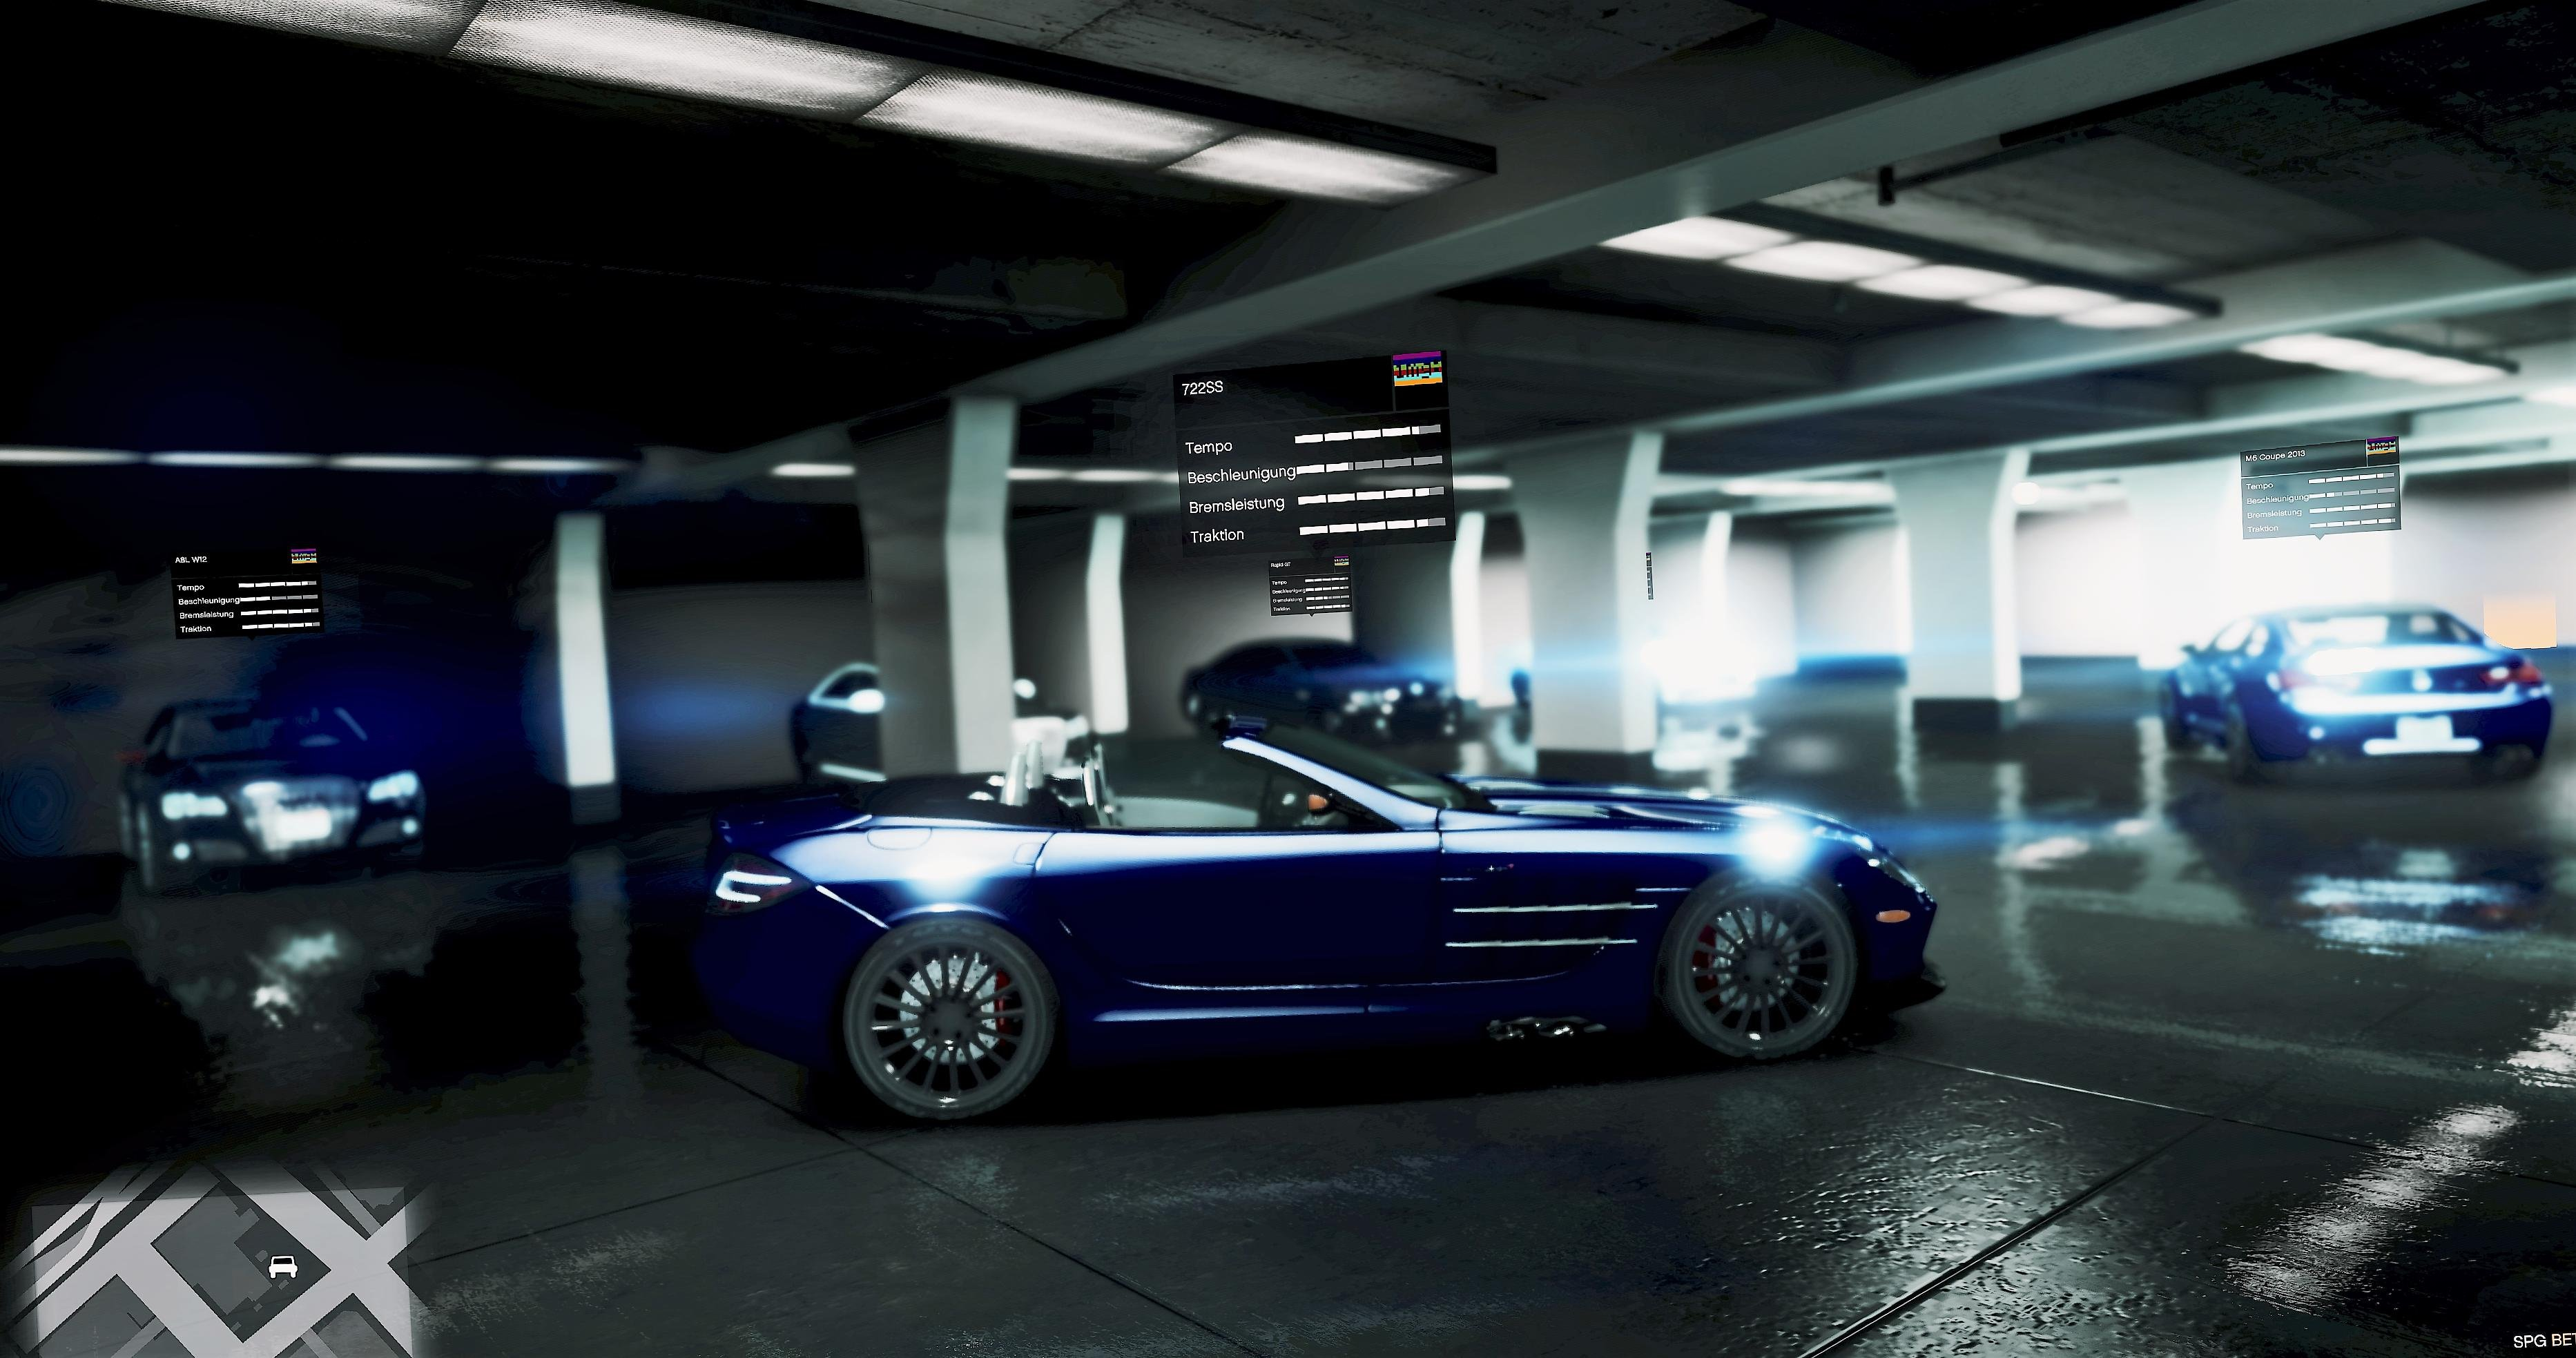 Luxury Garage Spg For 240 Cars Playboy Mansion Gta5 Modscom